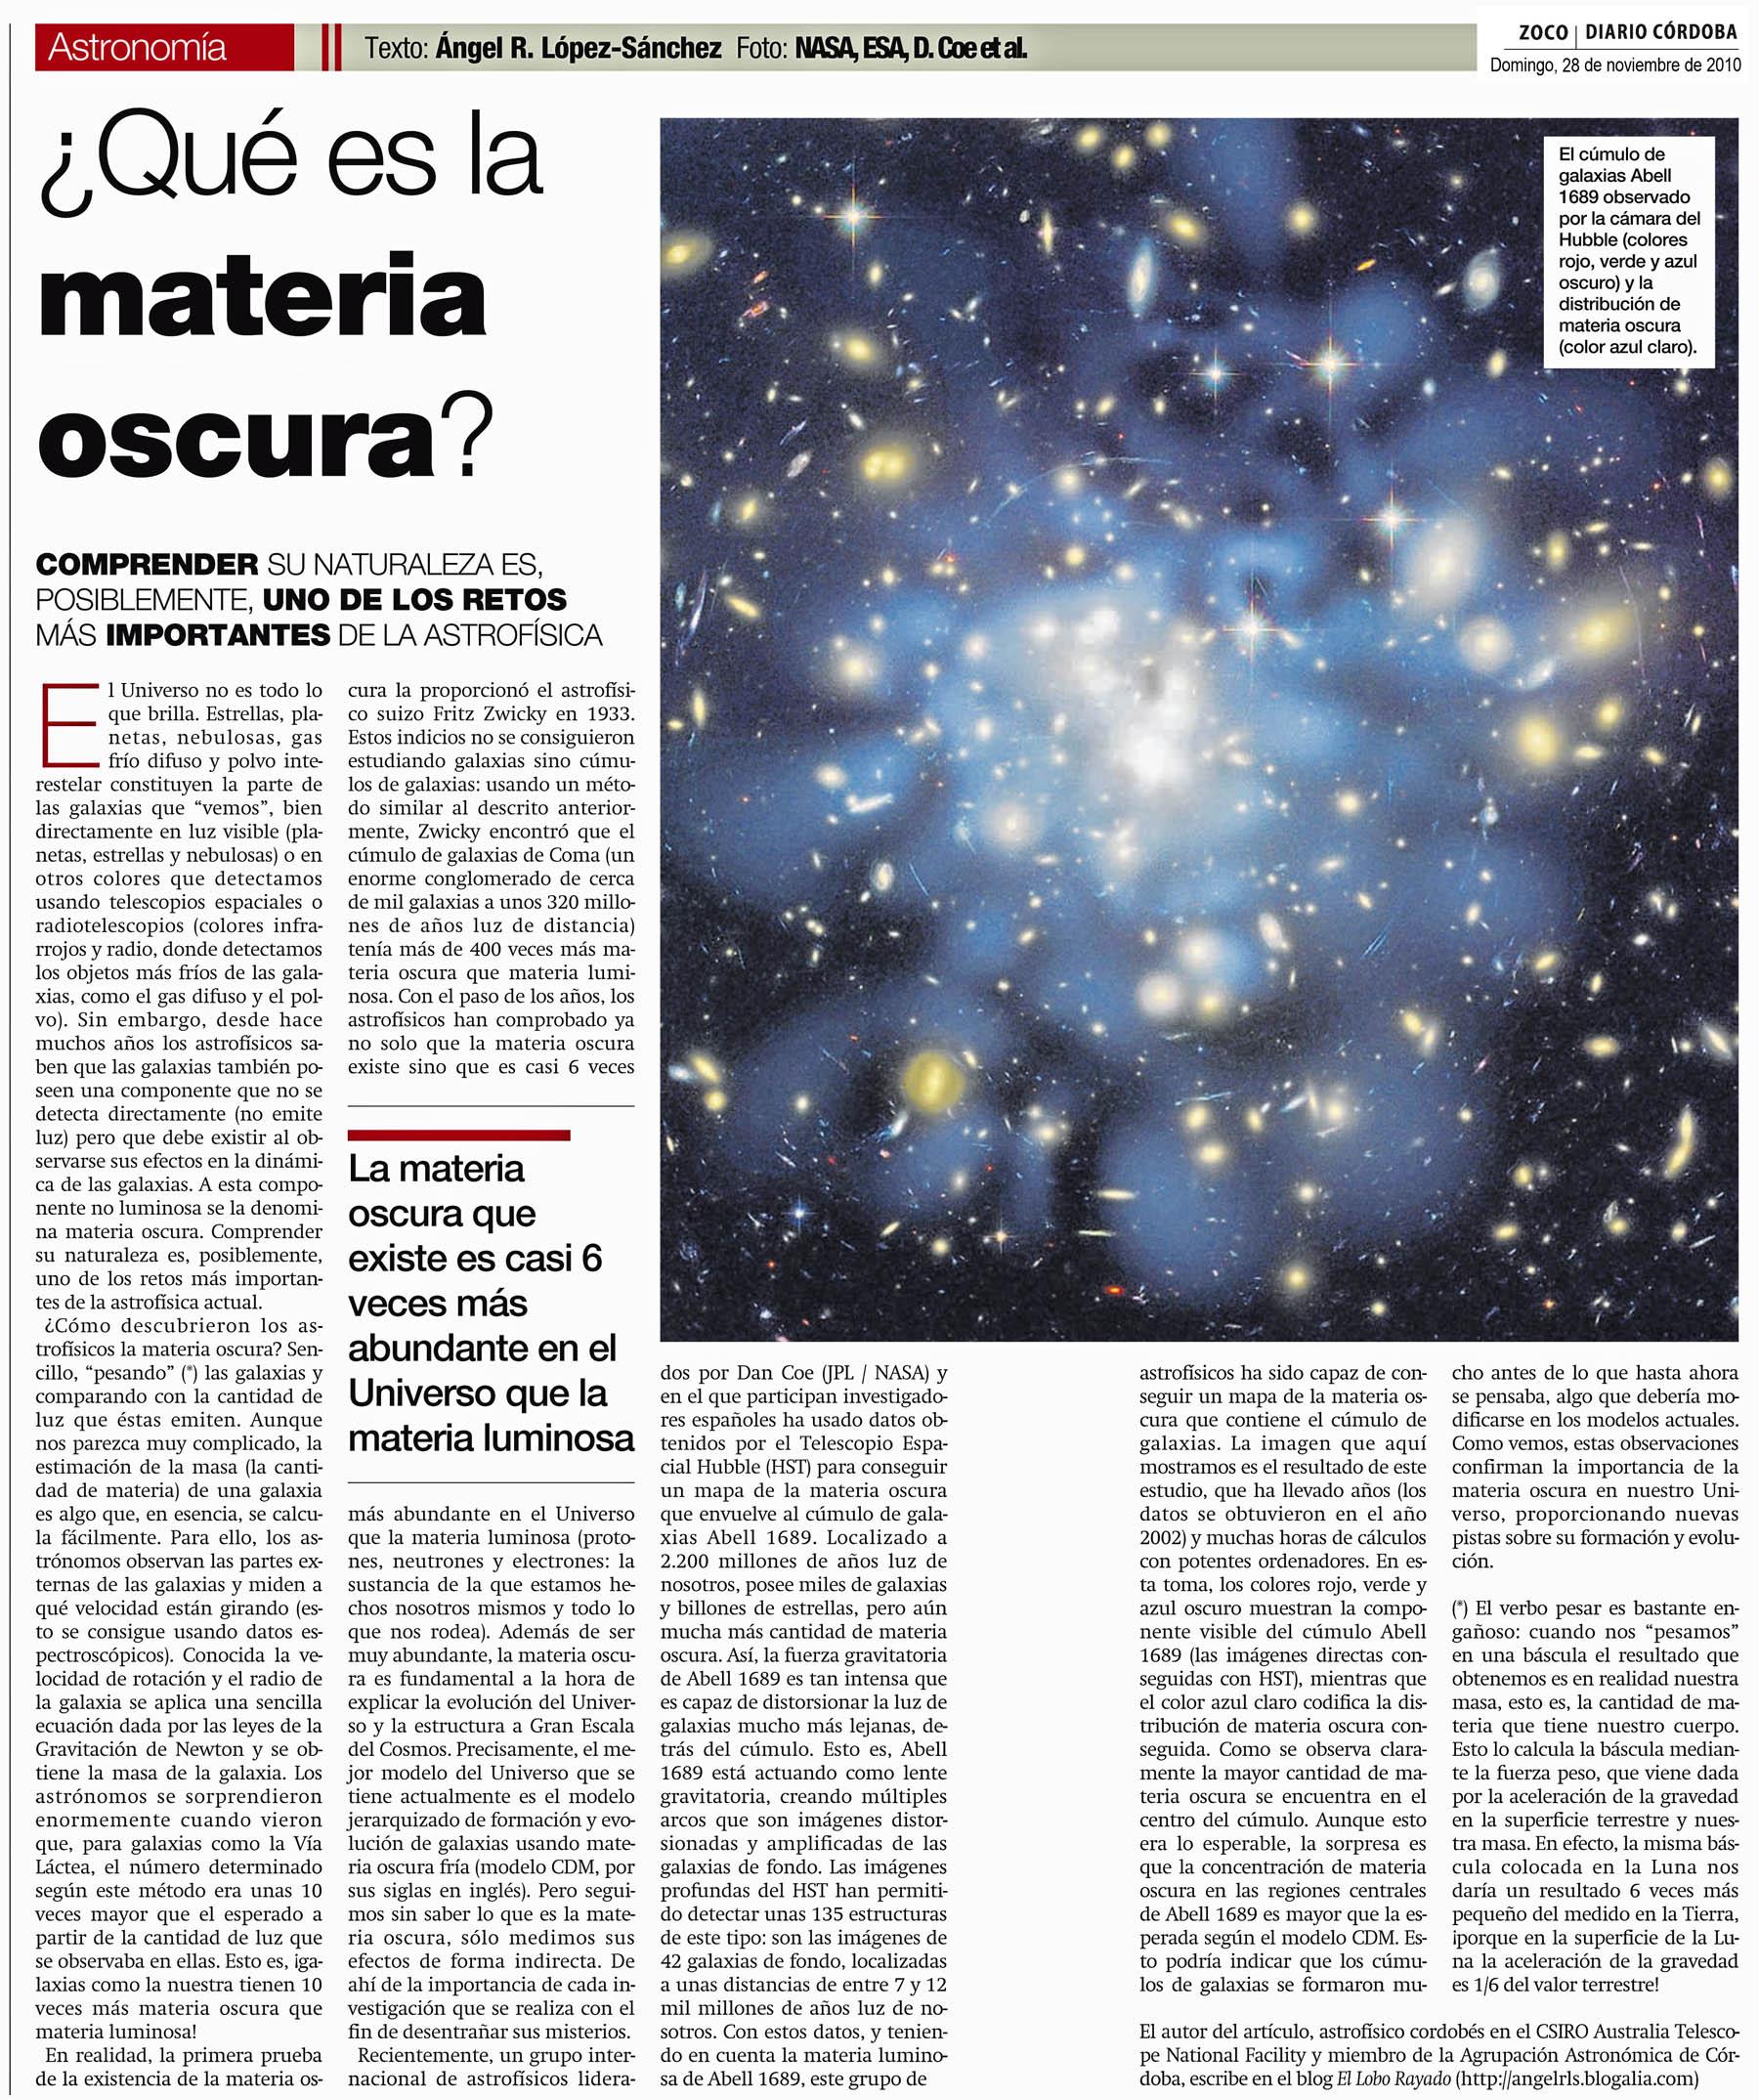 2010_11_28_Suplemento_Zoco_Diario_Cordoba_Que_es_la_materia_oscura_300pp_med.jpg